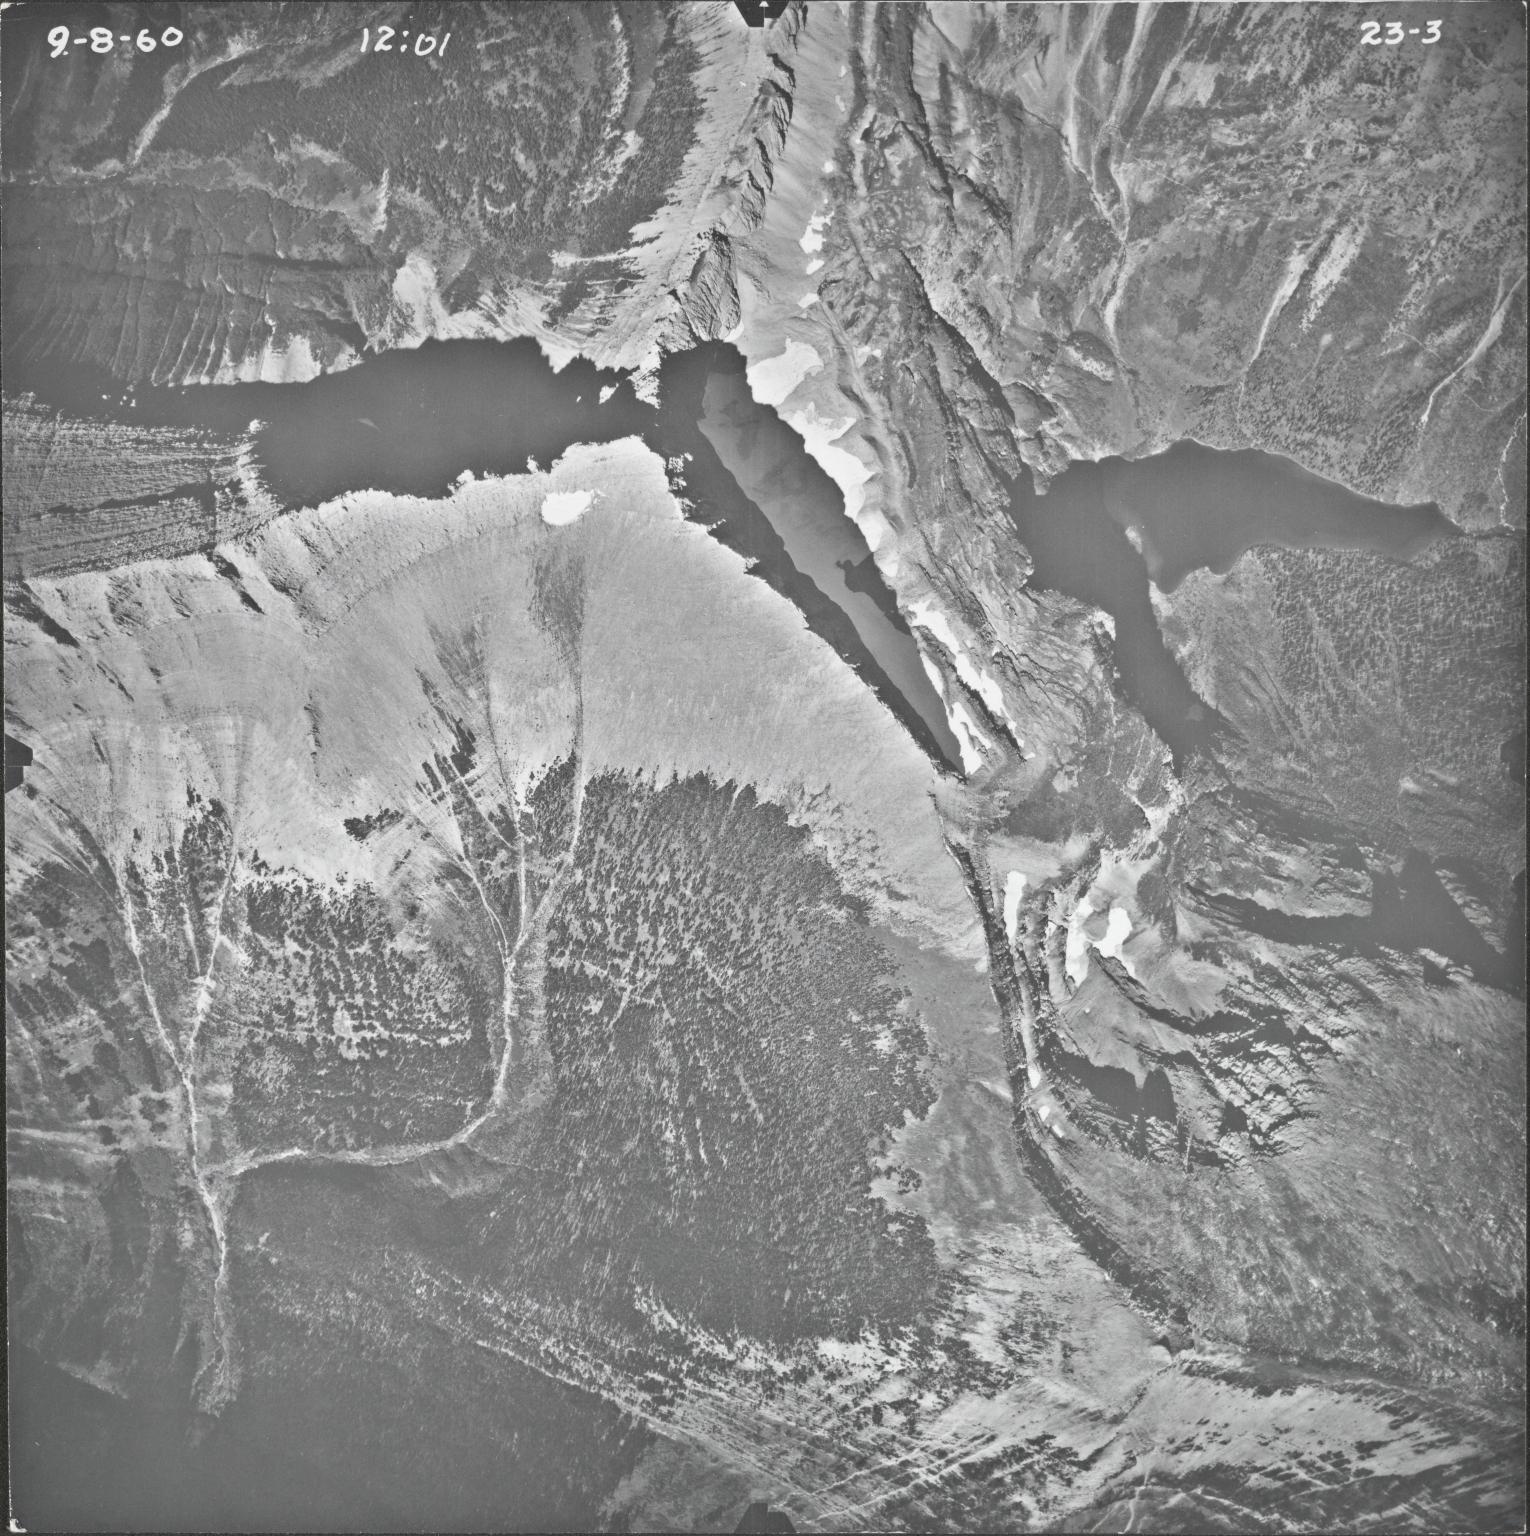 Triple Divide Peak, aerial photograph 23-3, Montana